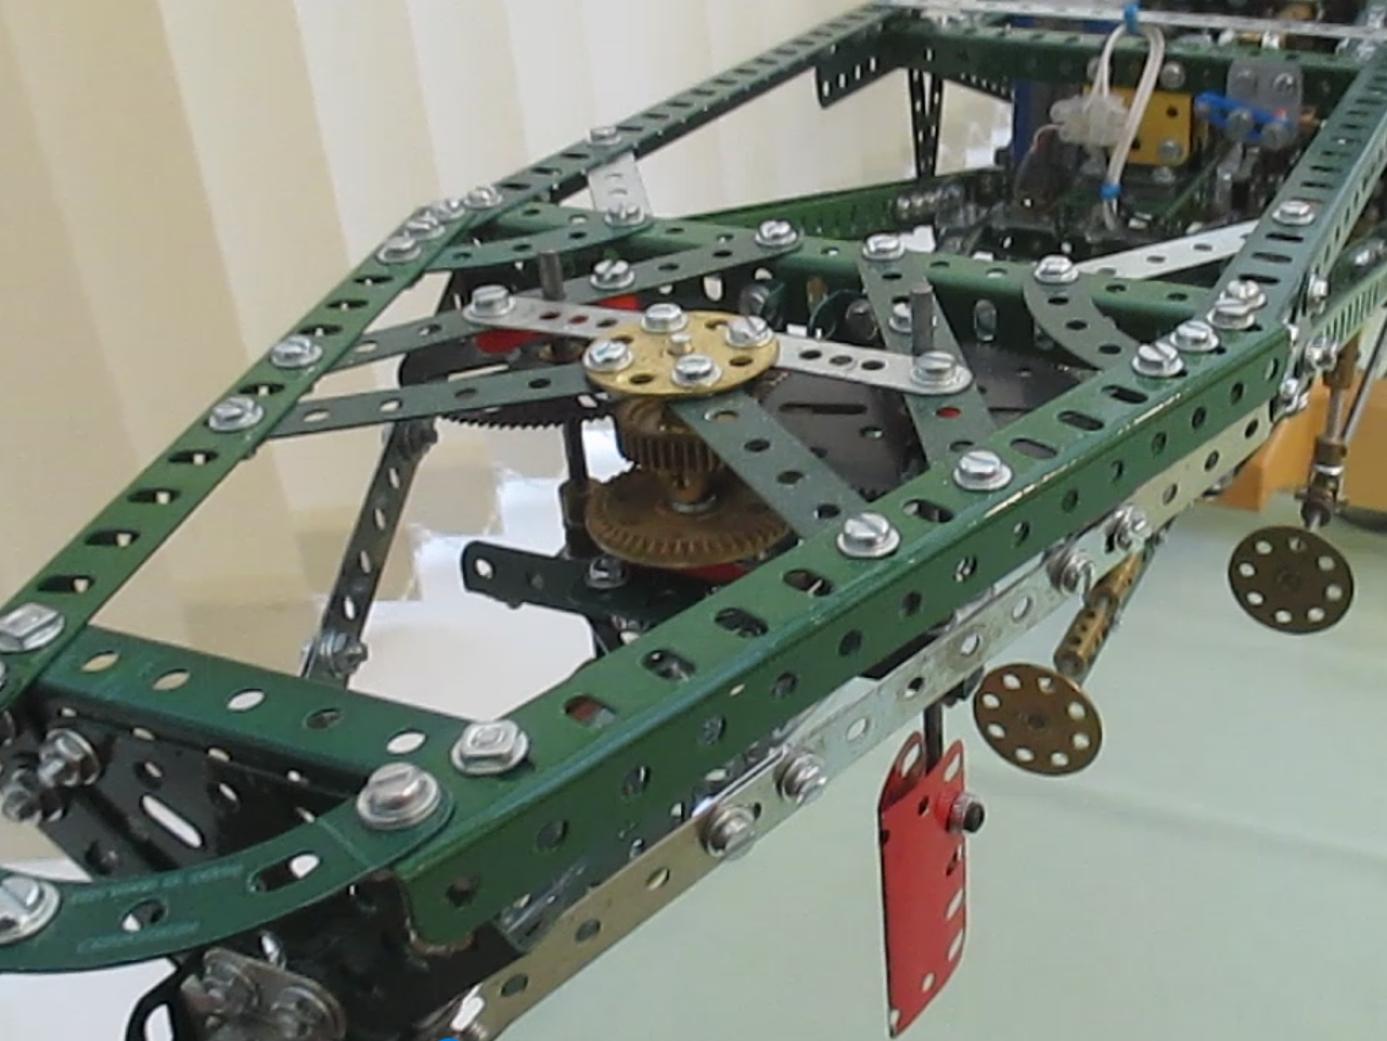 Rudder gears